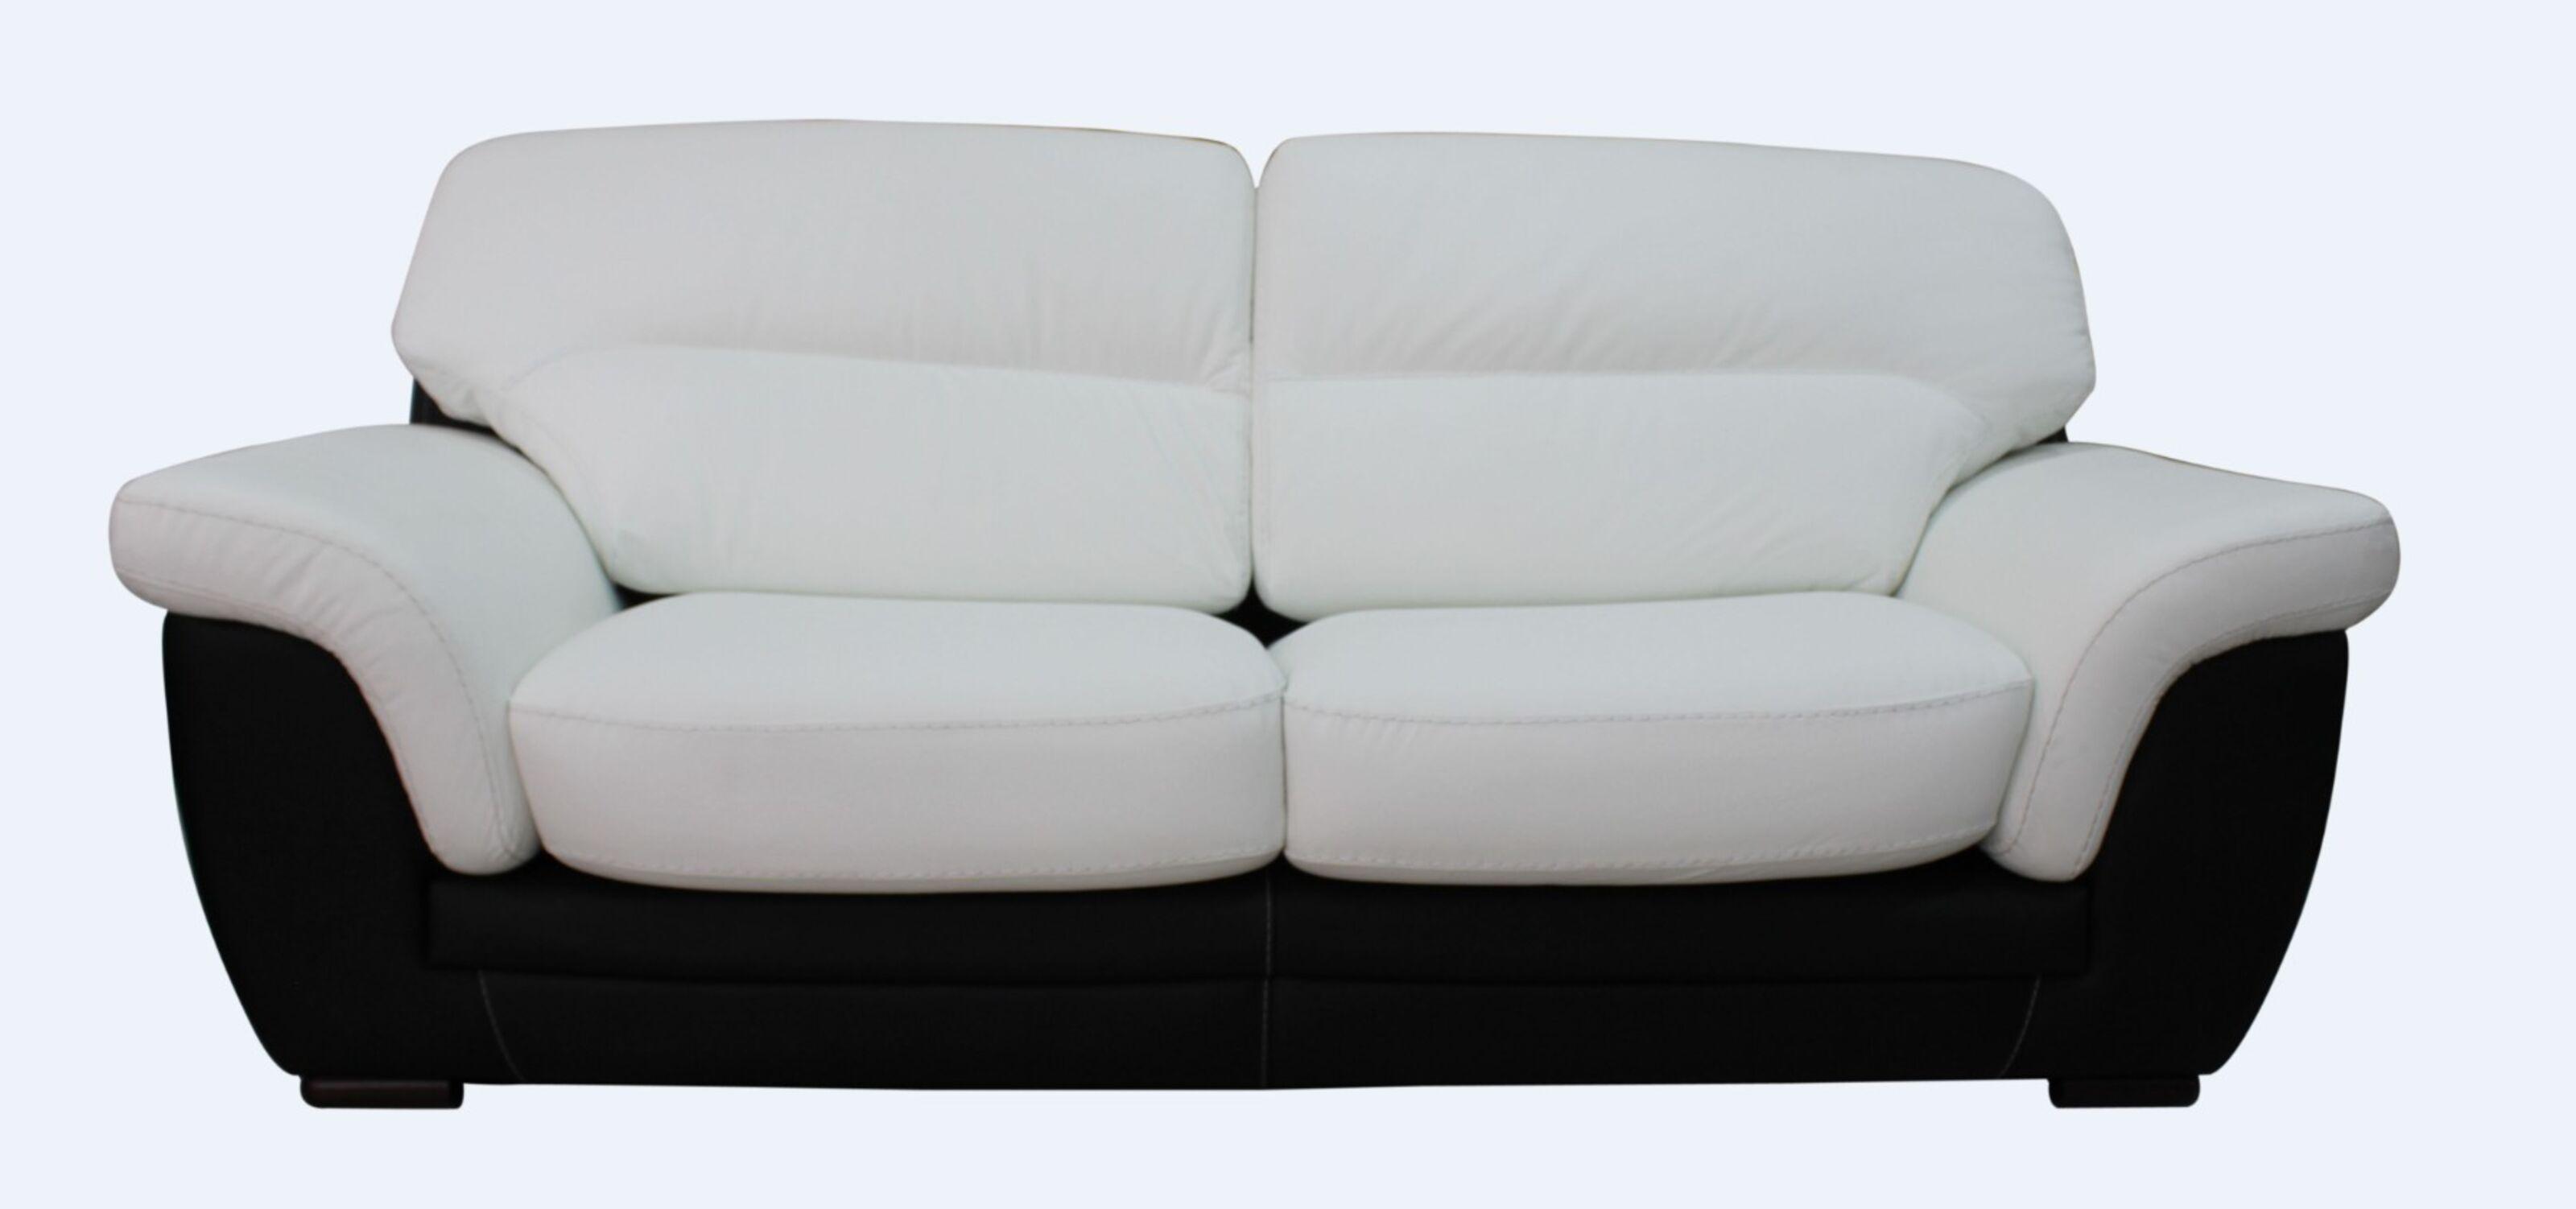 Stupendous Daniel 3 Seater Italian Leather Contemporary Sofa Black White Pdpeps Interior Chair Design Pdpepsorg